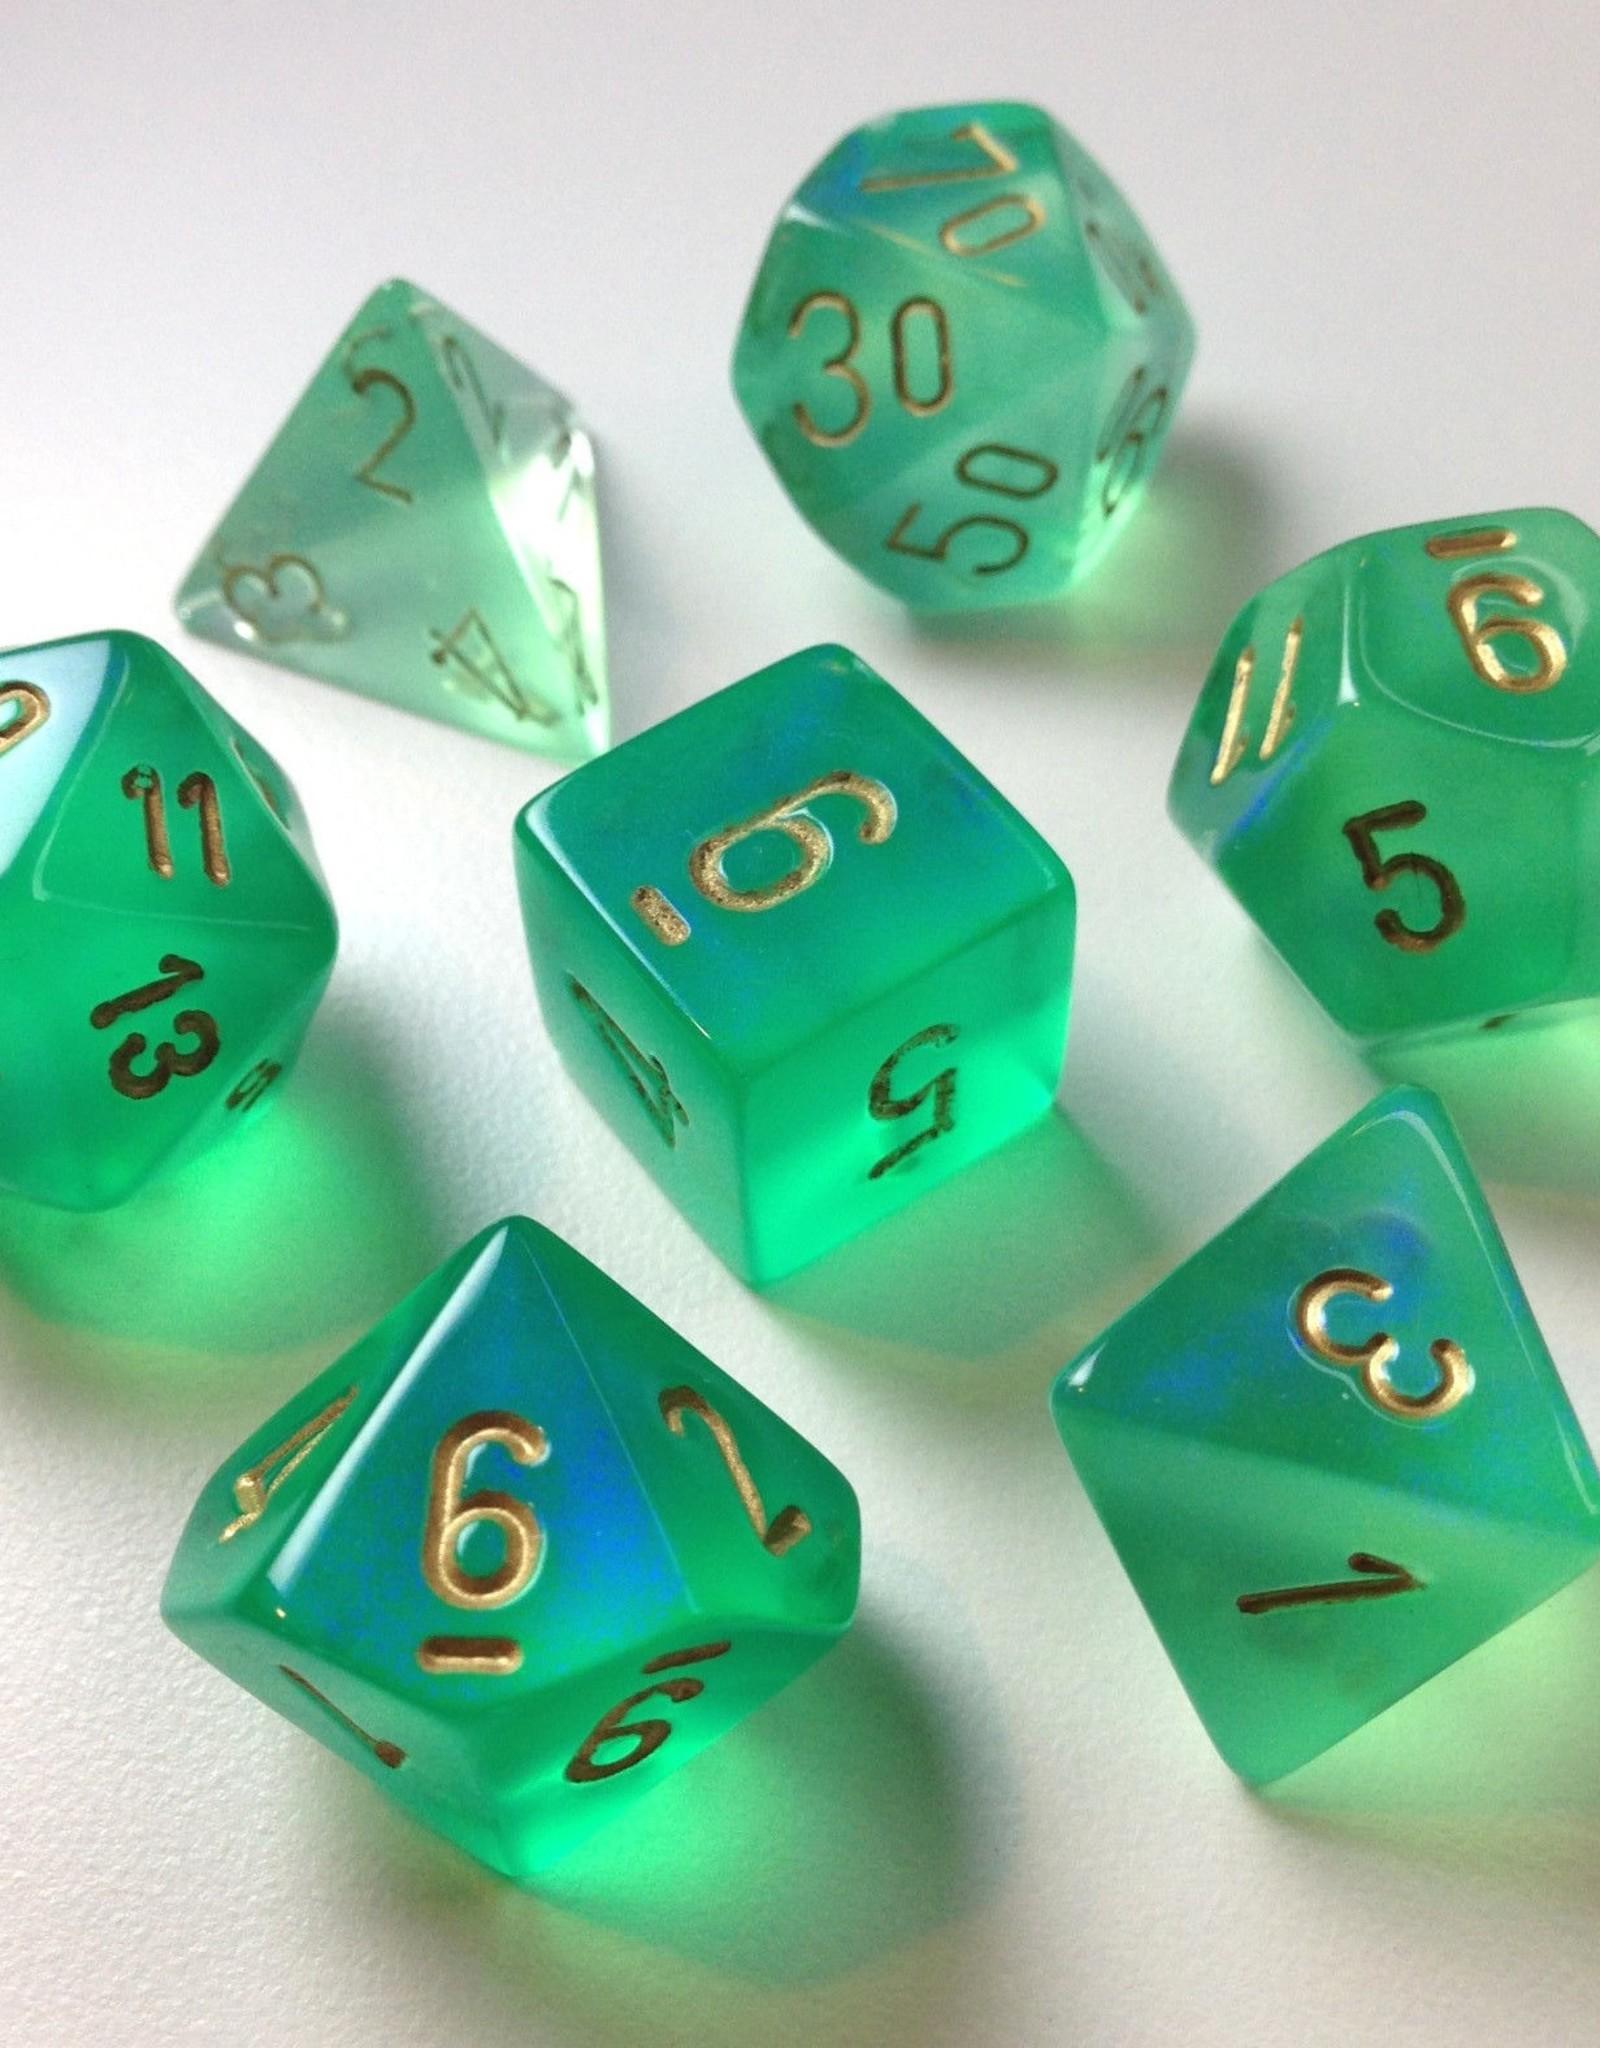 Chessex Chessex 7-Die set Borealis - Light Green/Gold